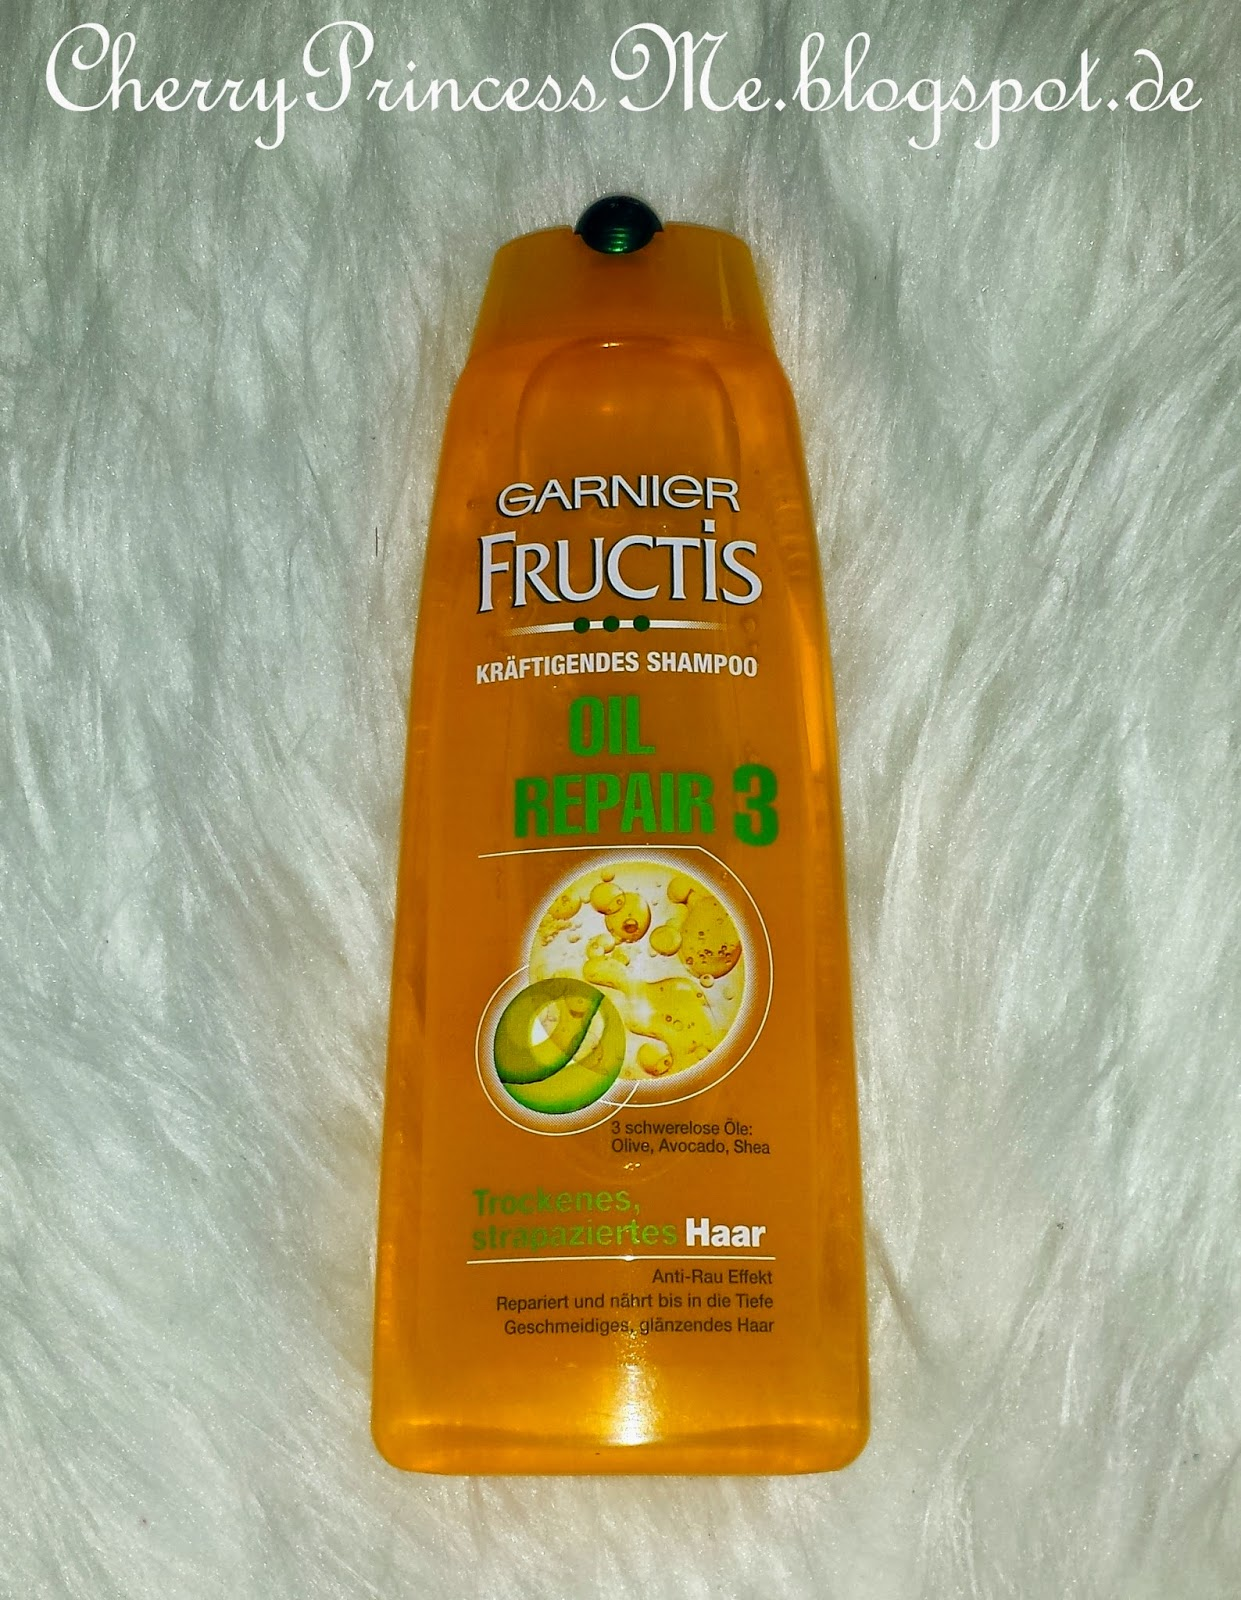 cherryprincess garnier fructis oil repair 3. Black Bedroom Furniture Sets. Home Design Ideas